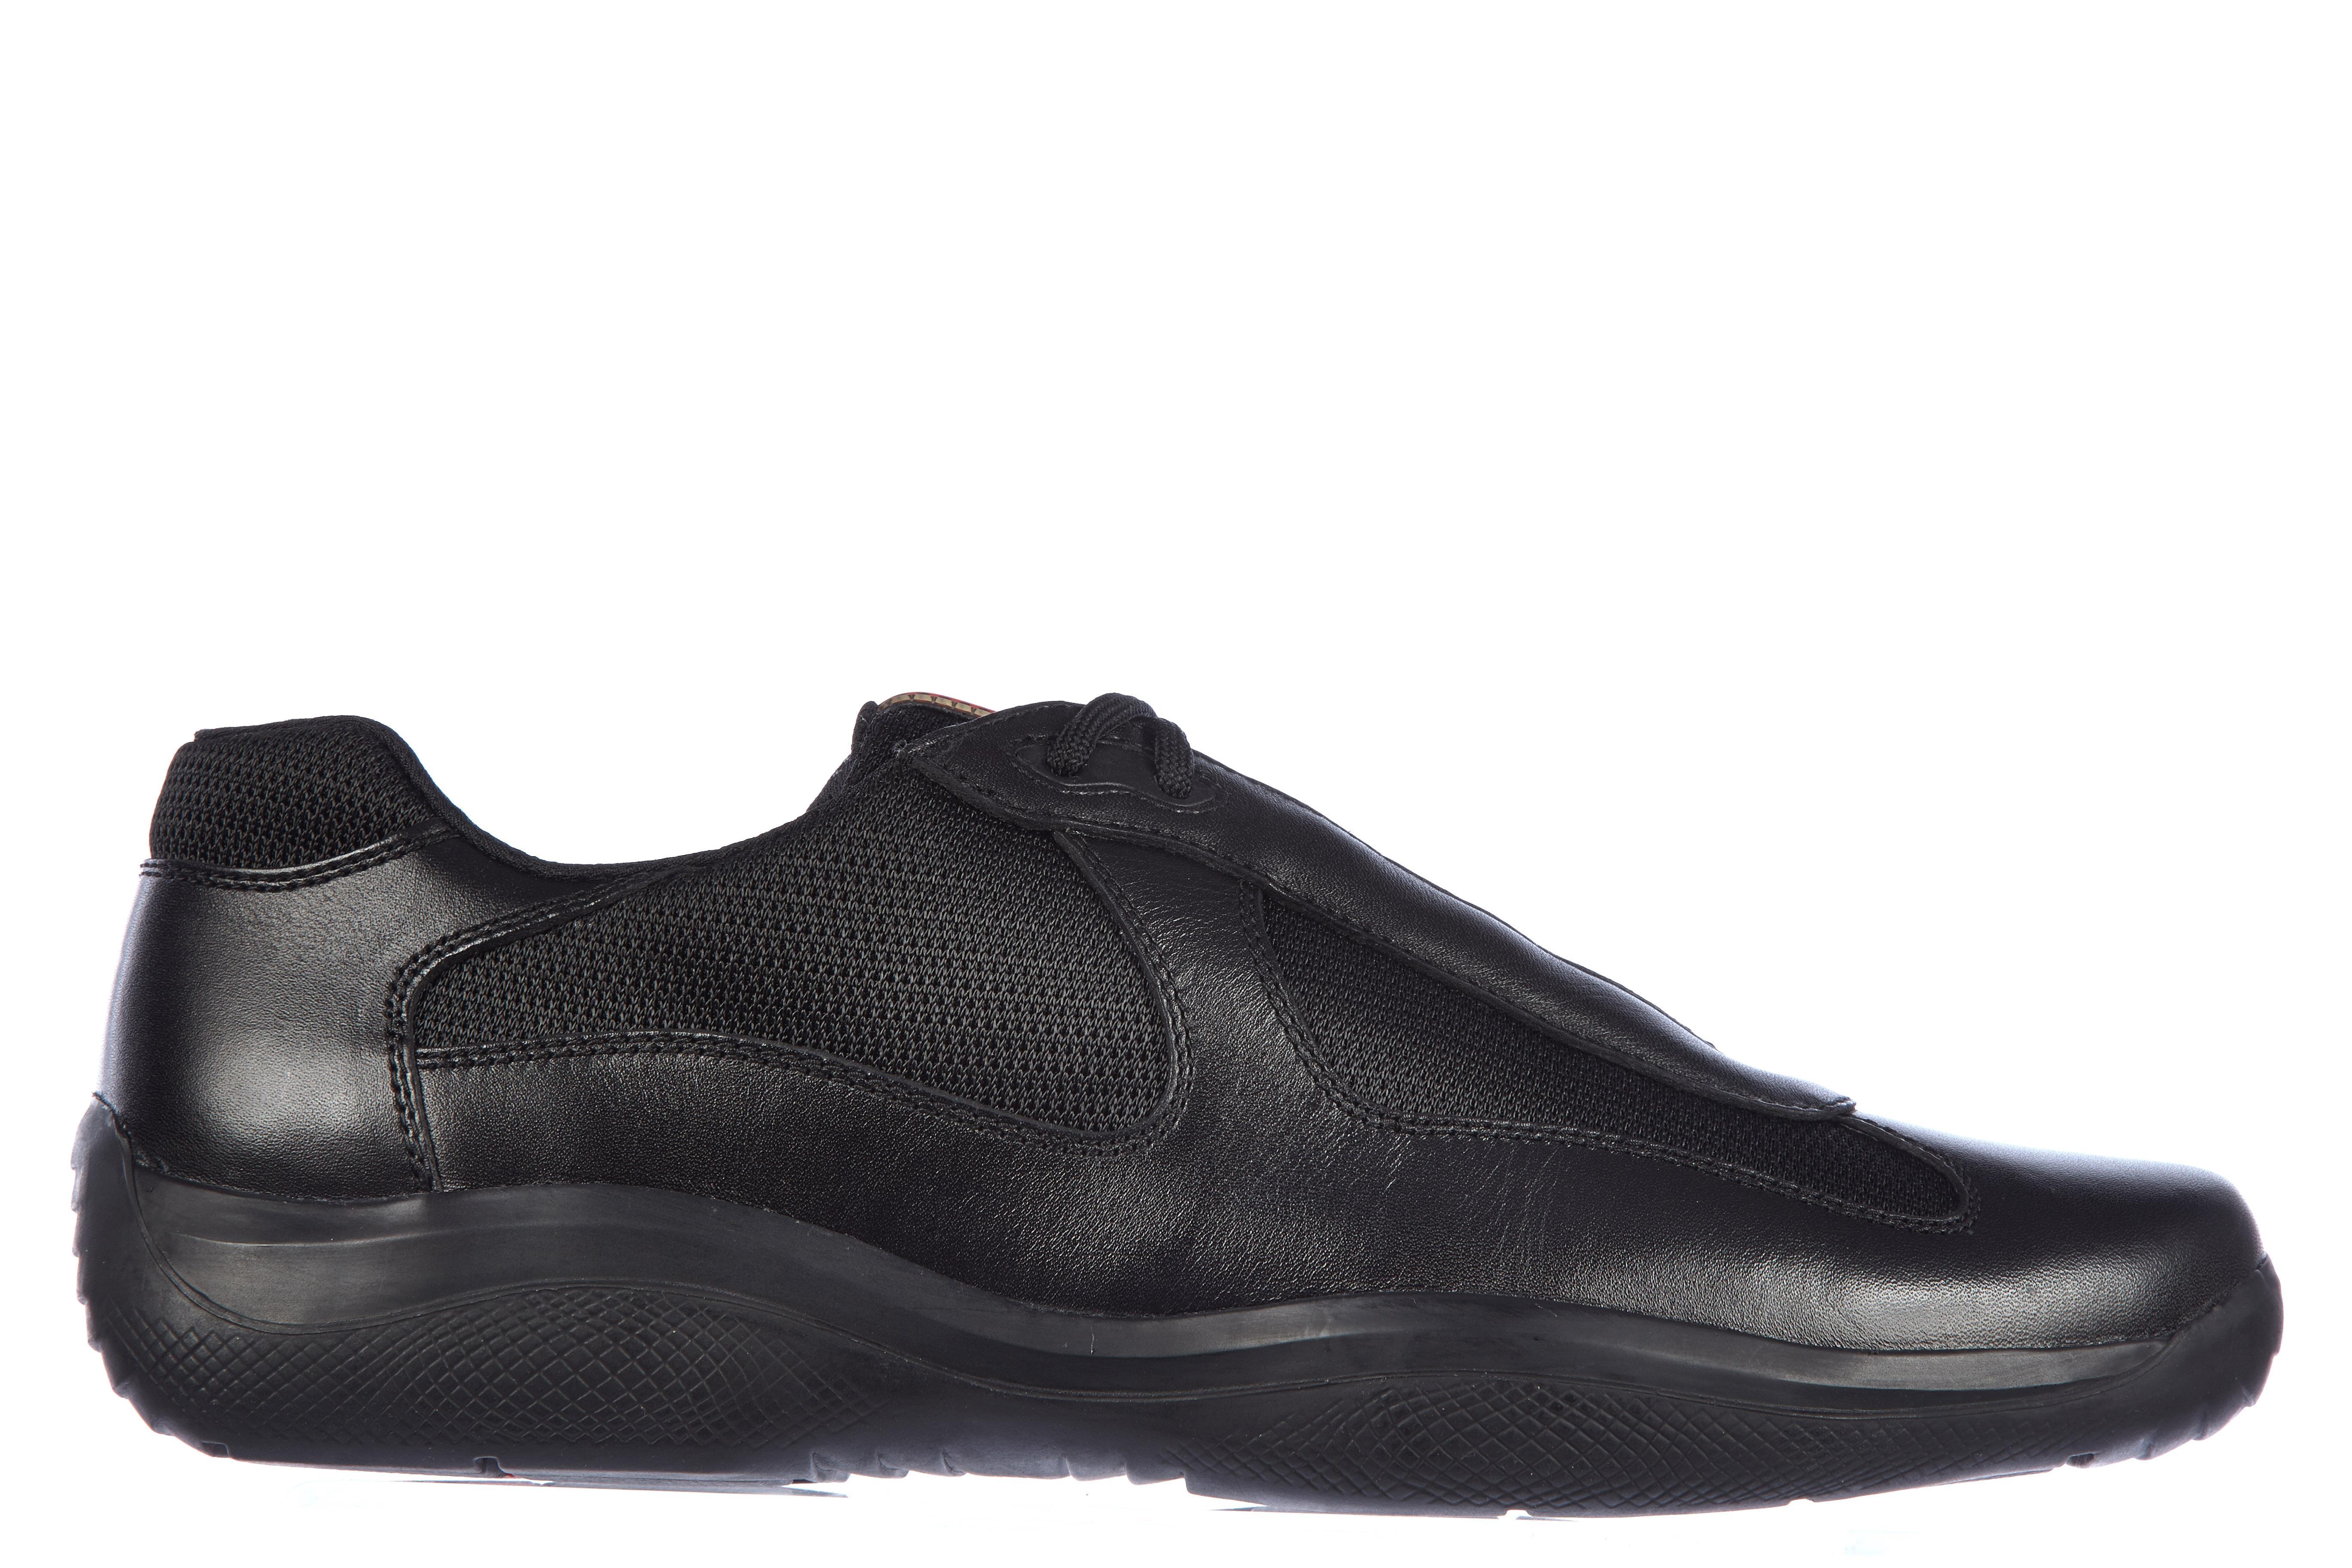 Prada Men's Shoes Leather Trainers Sneakers Nevada Bike In Black